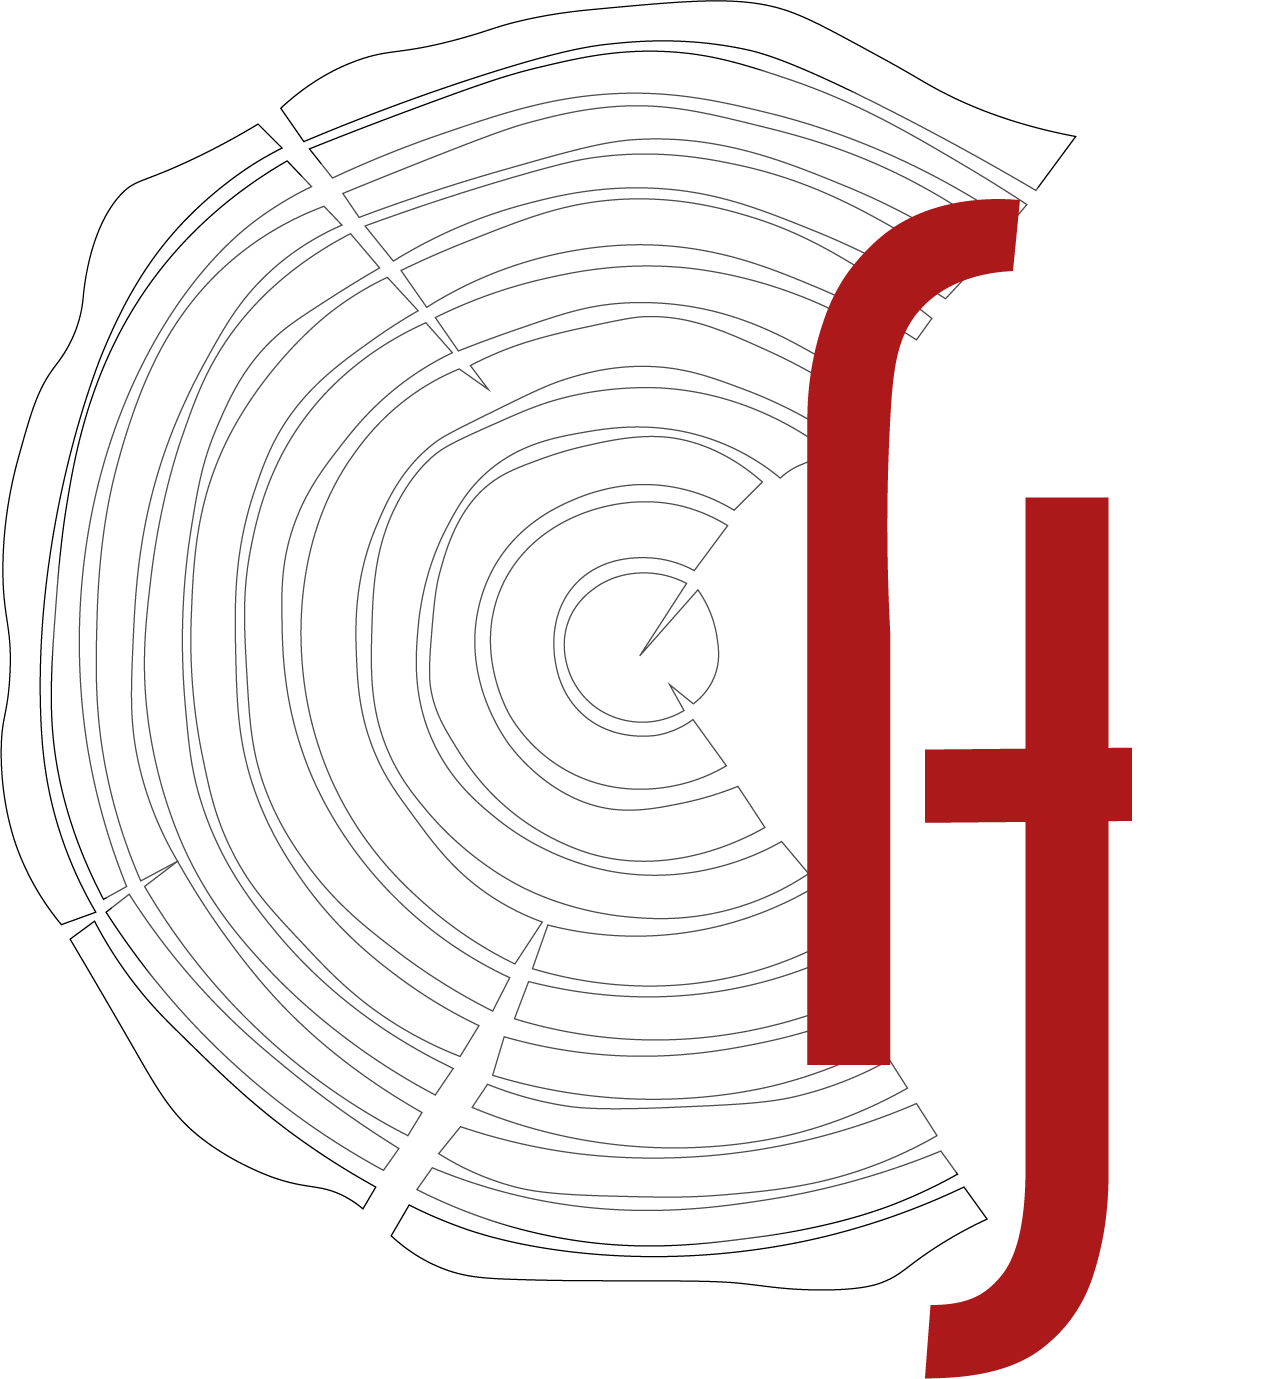 cropped-logo-def-1-2.png